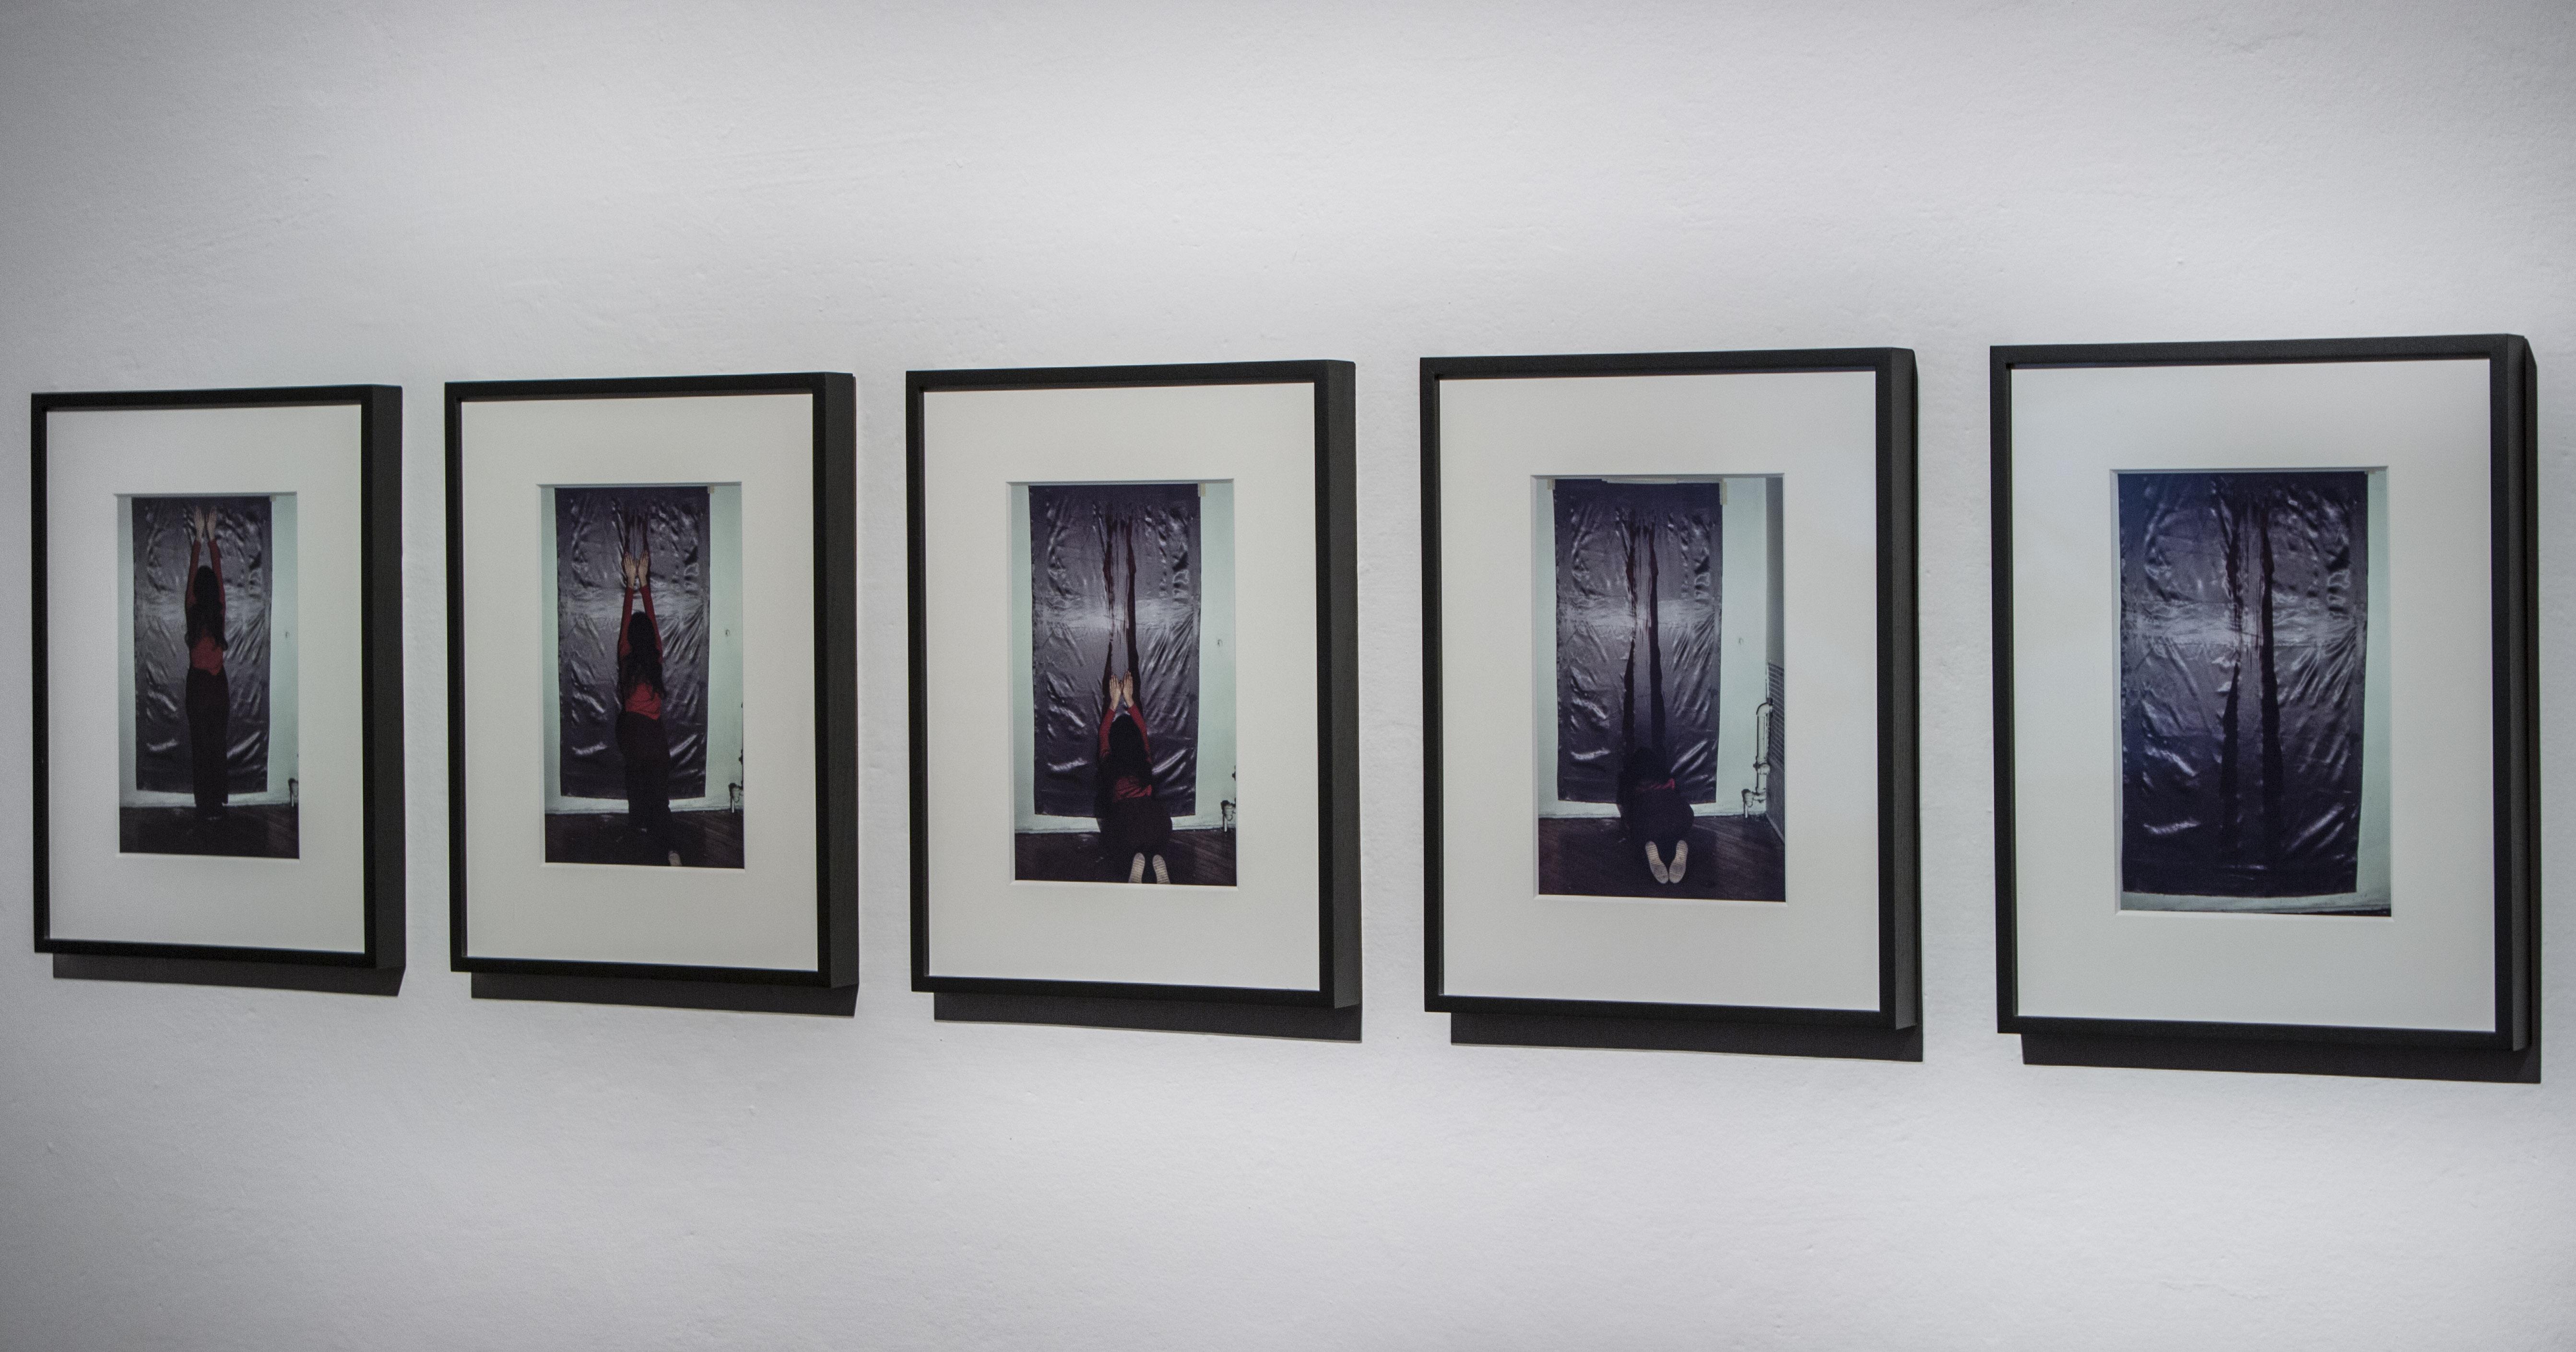 Ana Mendieta, Untitled (Body Tracks), Foto © Marco Caselli Nirmal